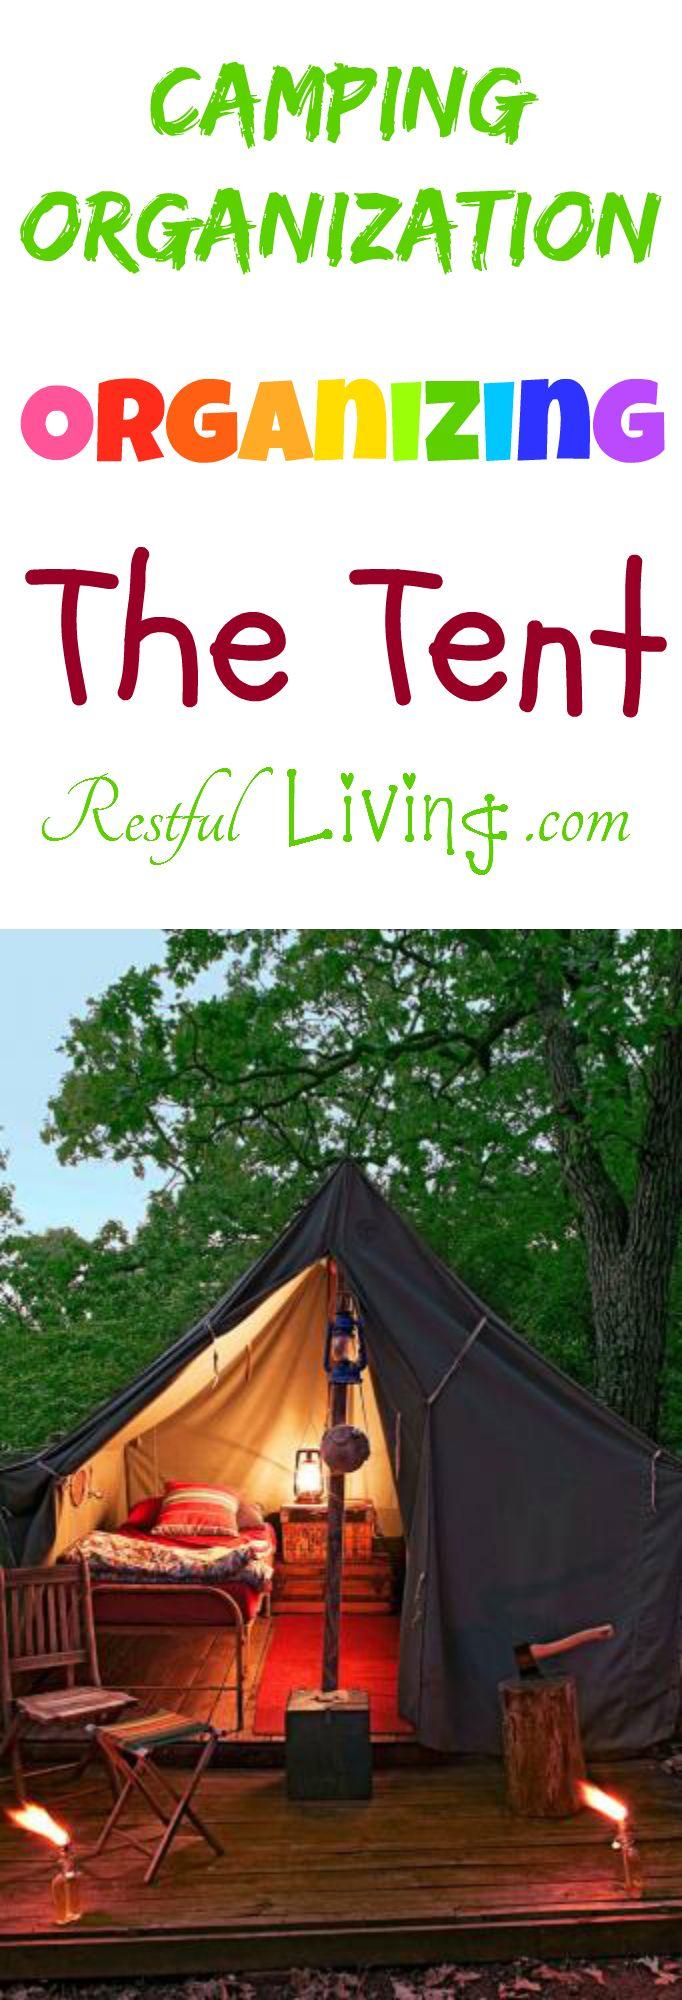 Organizing The Tent – Camping Organization #CampingTents101